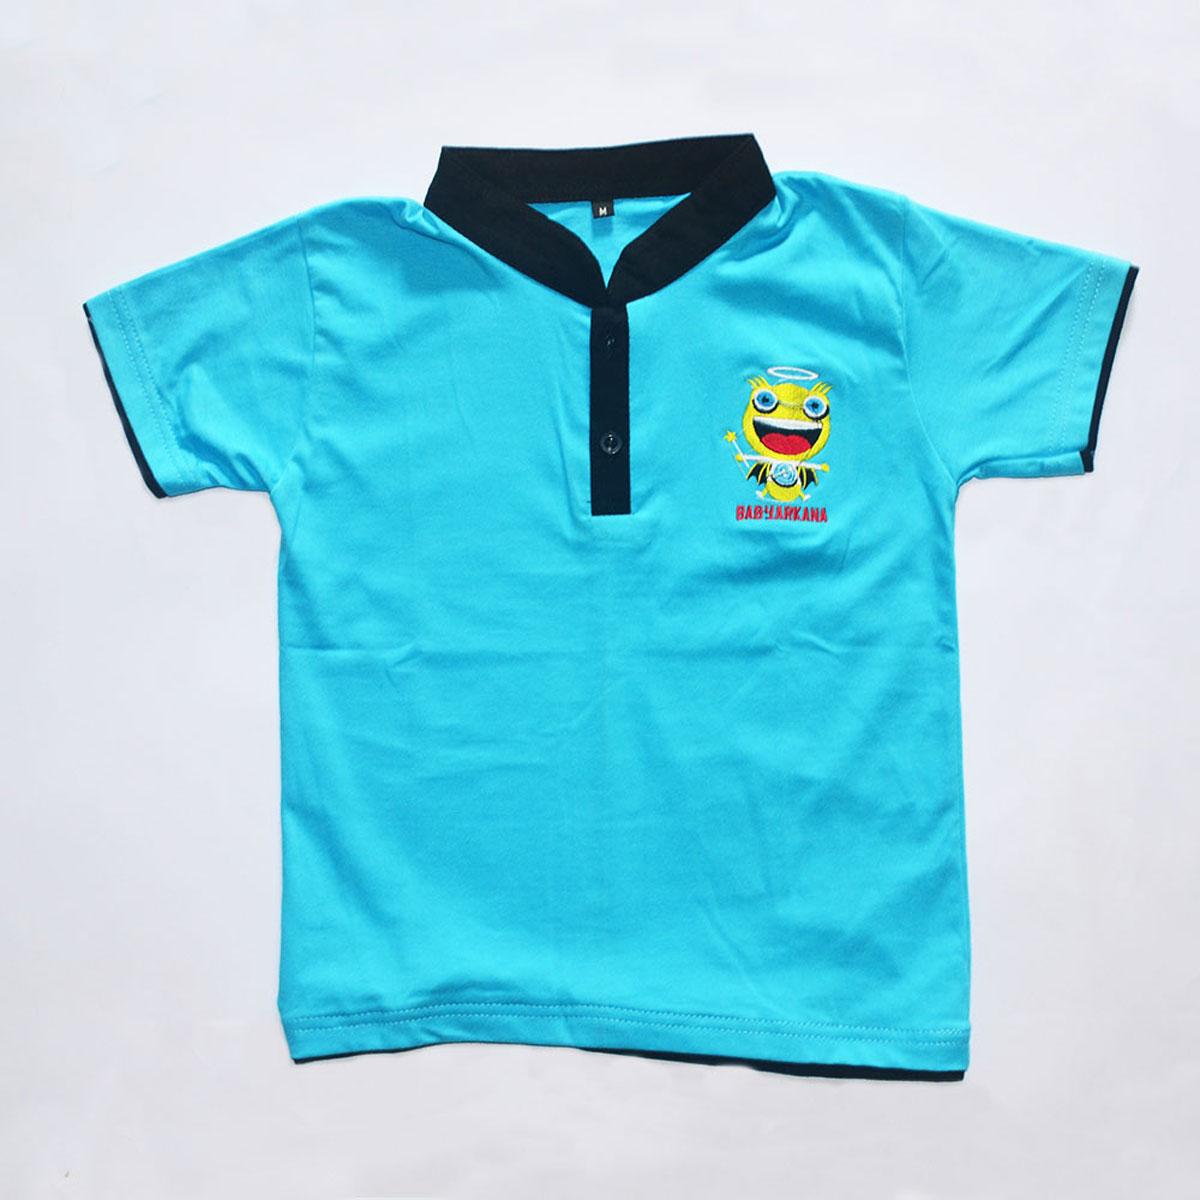 produksi baju anak